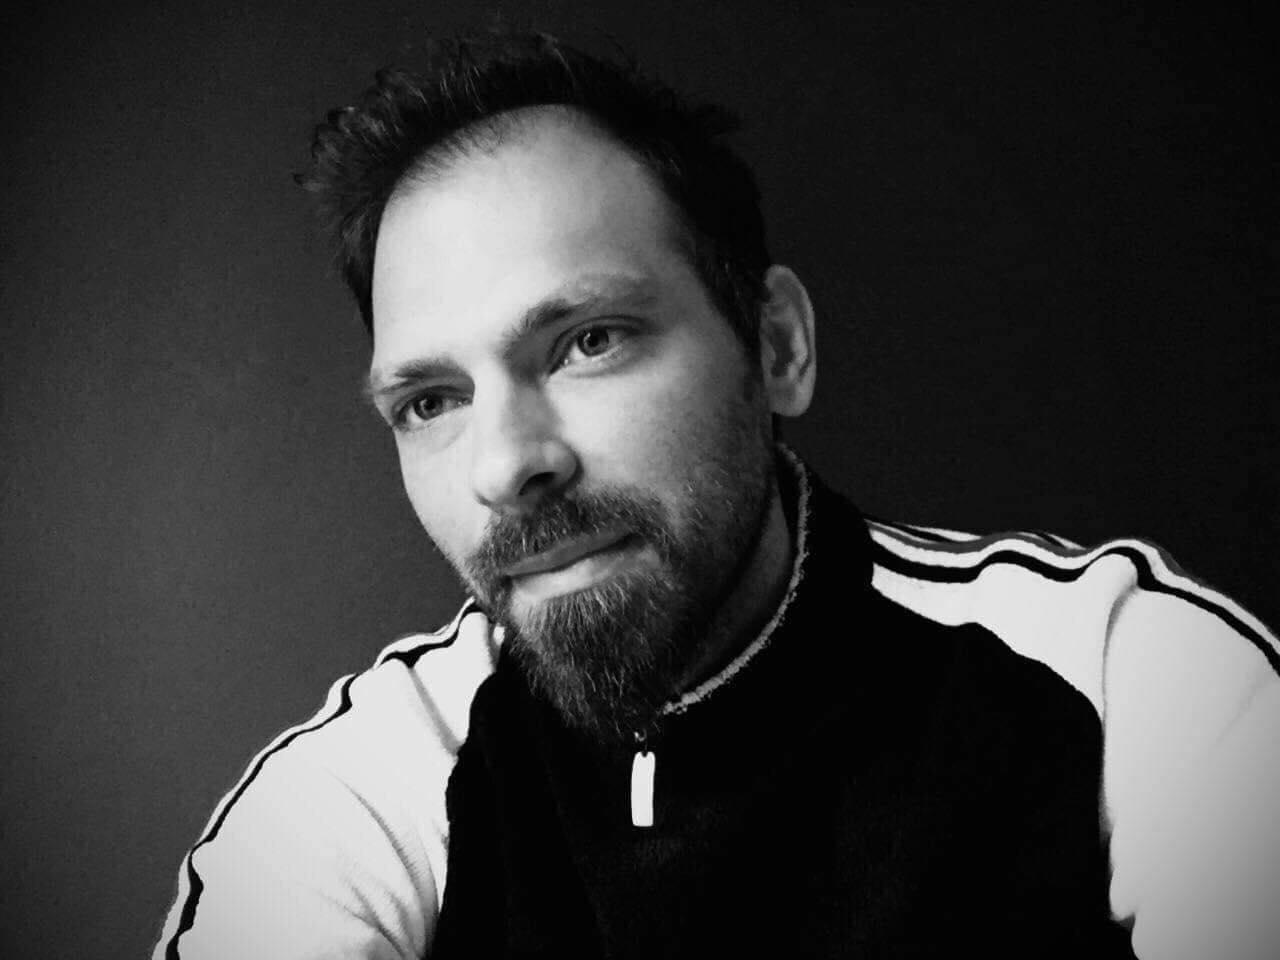 Panos Pristouris profile picture